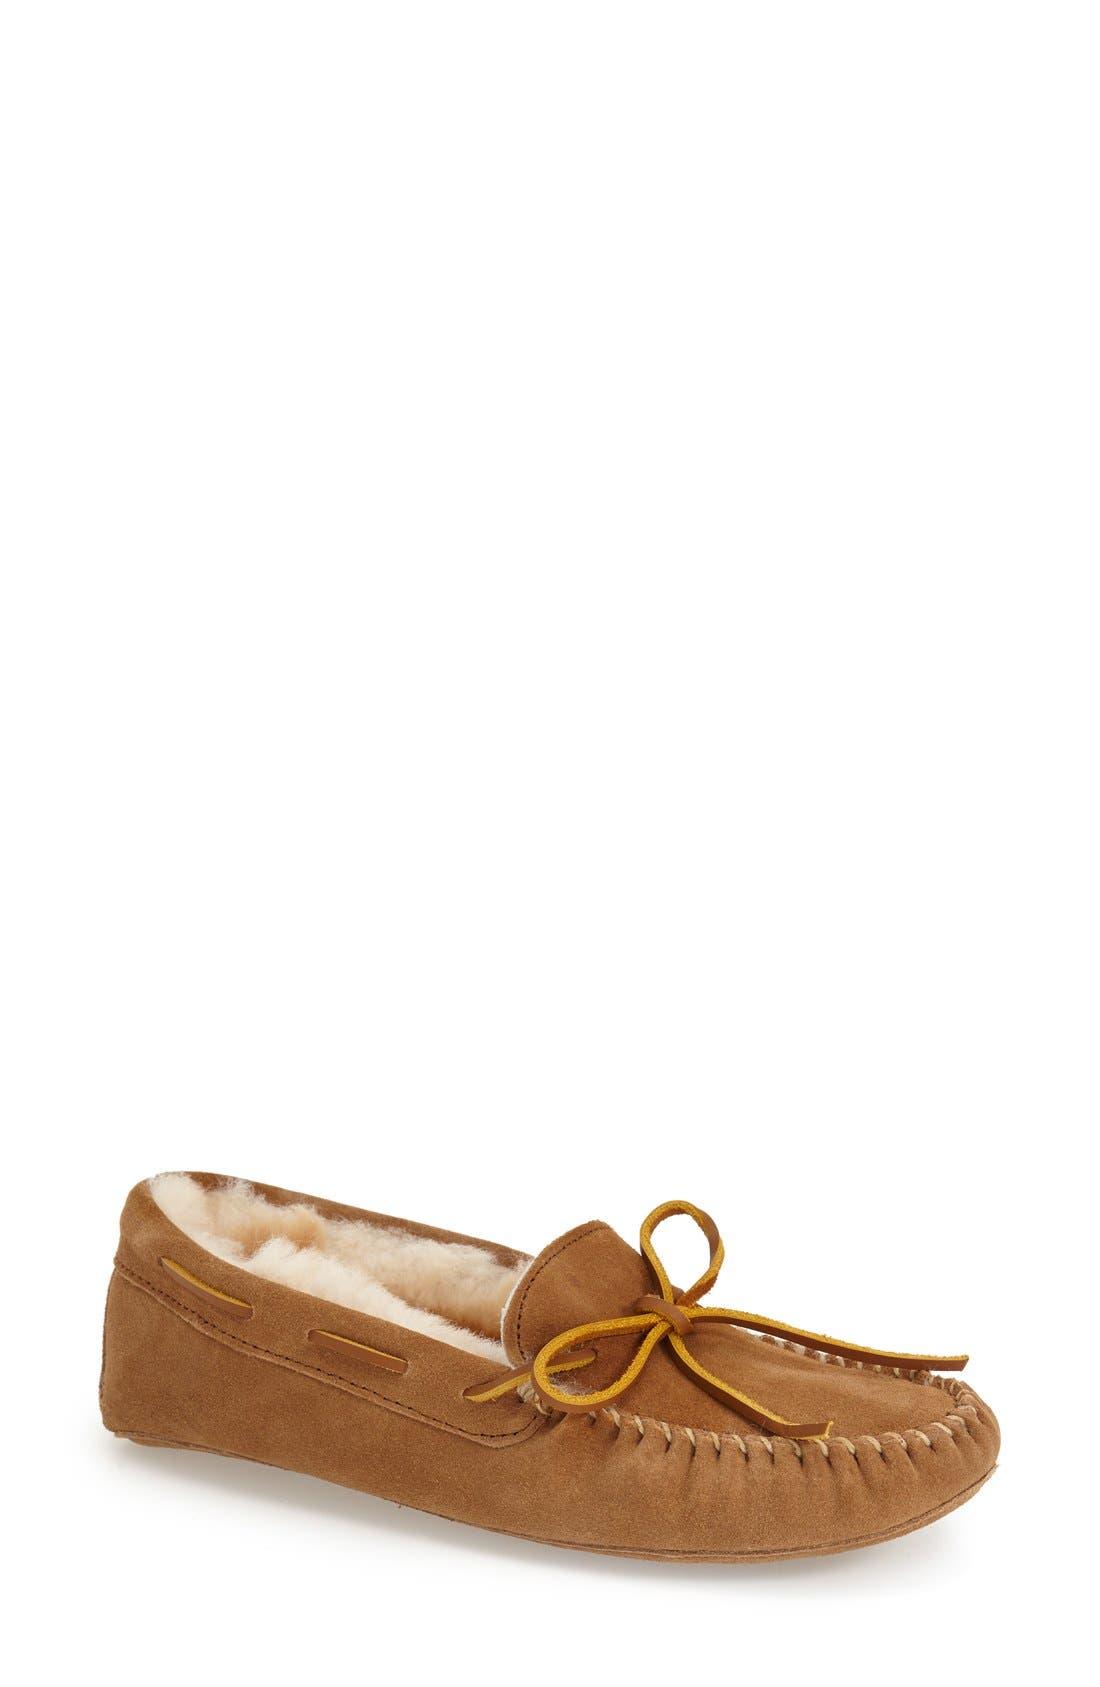 SheepskinMoccasin Slipper,                         Main,                         color, Tan Suede